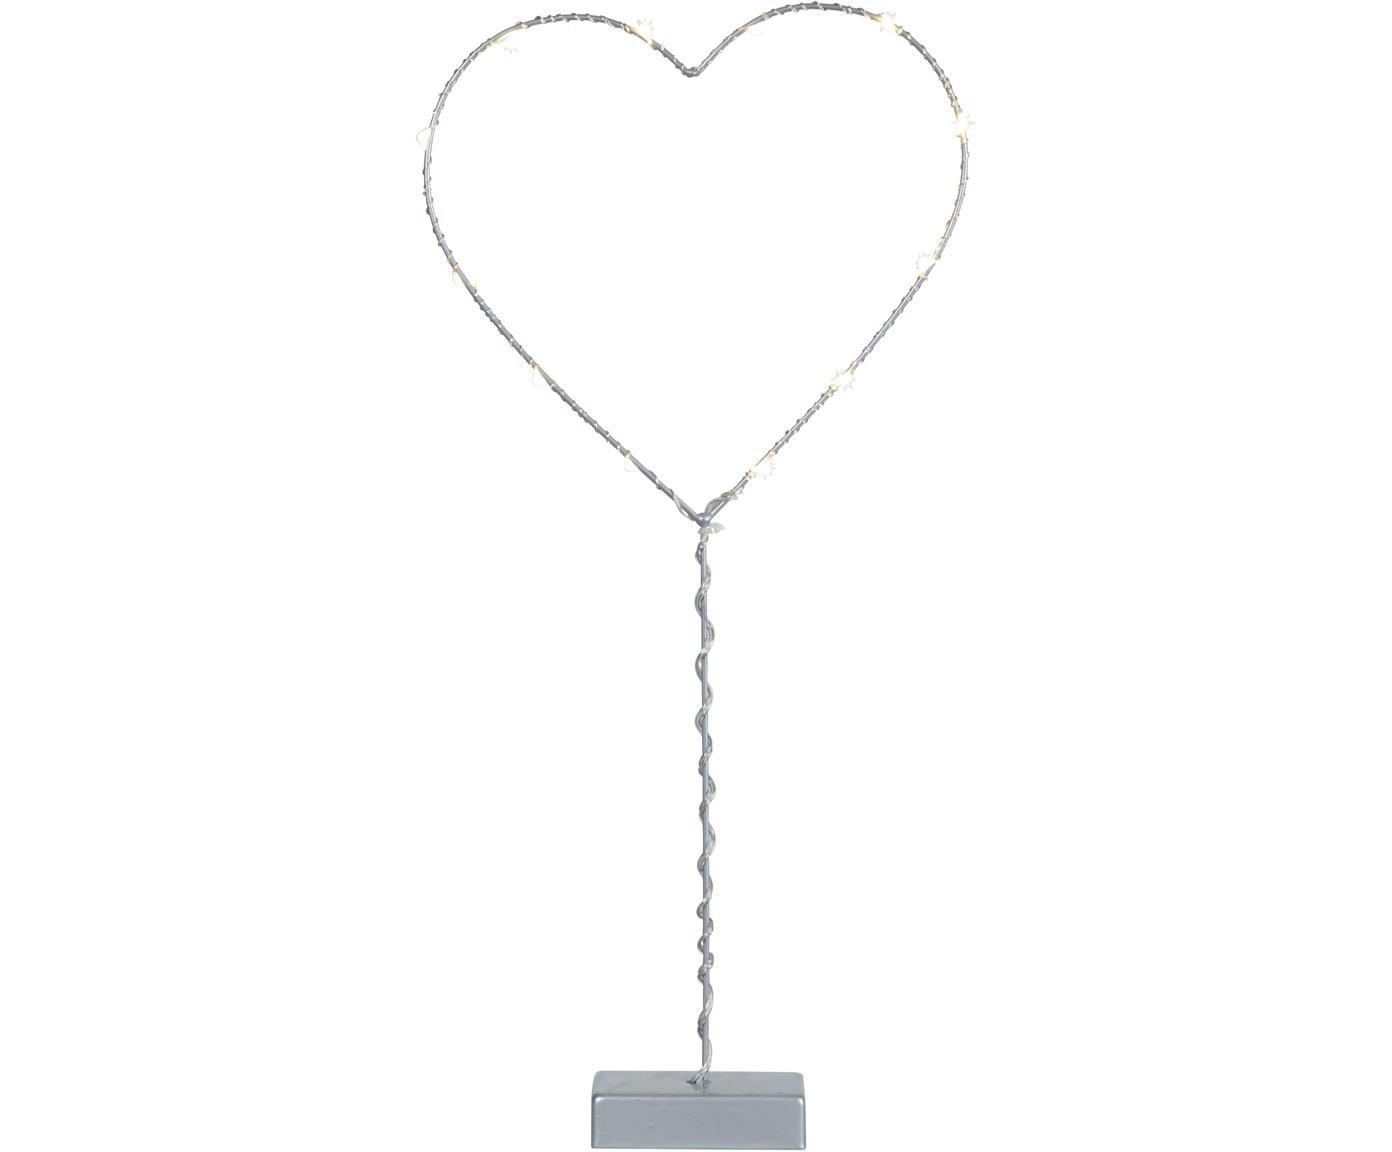 Objeto luminoso LED Heart, funciona a pilas, Cable: plástico, Gris, An 20 x Al 43 cm